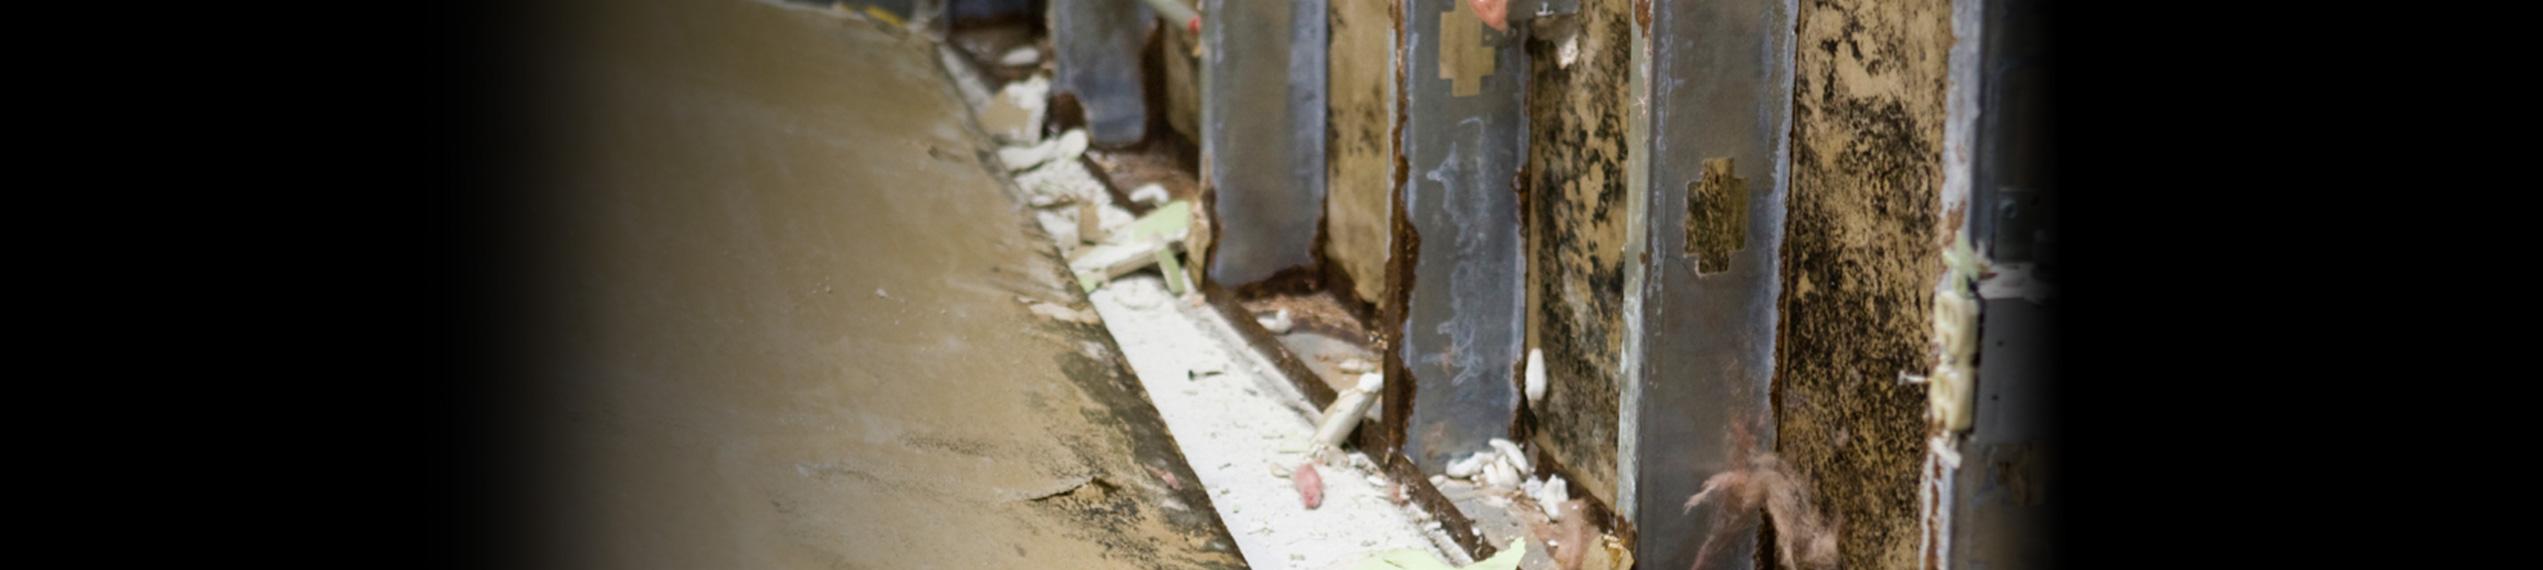 Mold remediation by Paul Davis Restoration of Greater Seattle